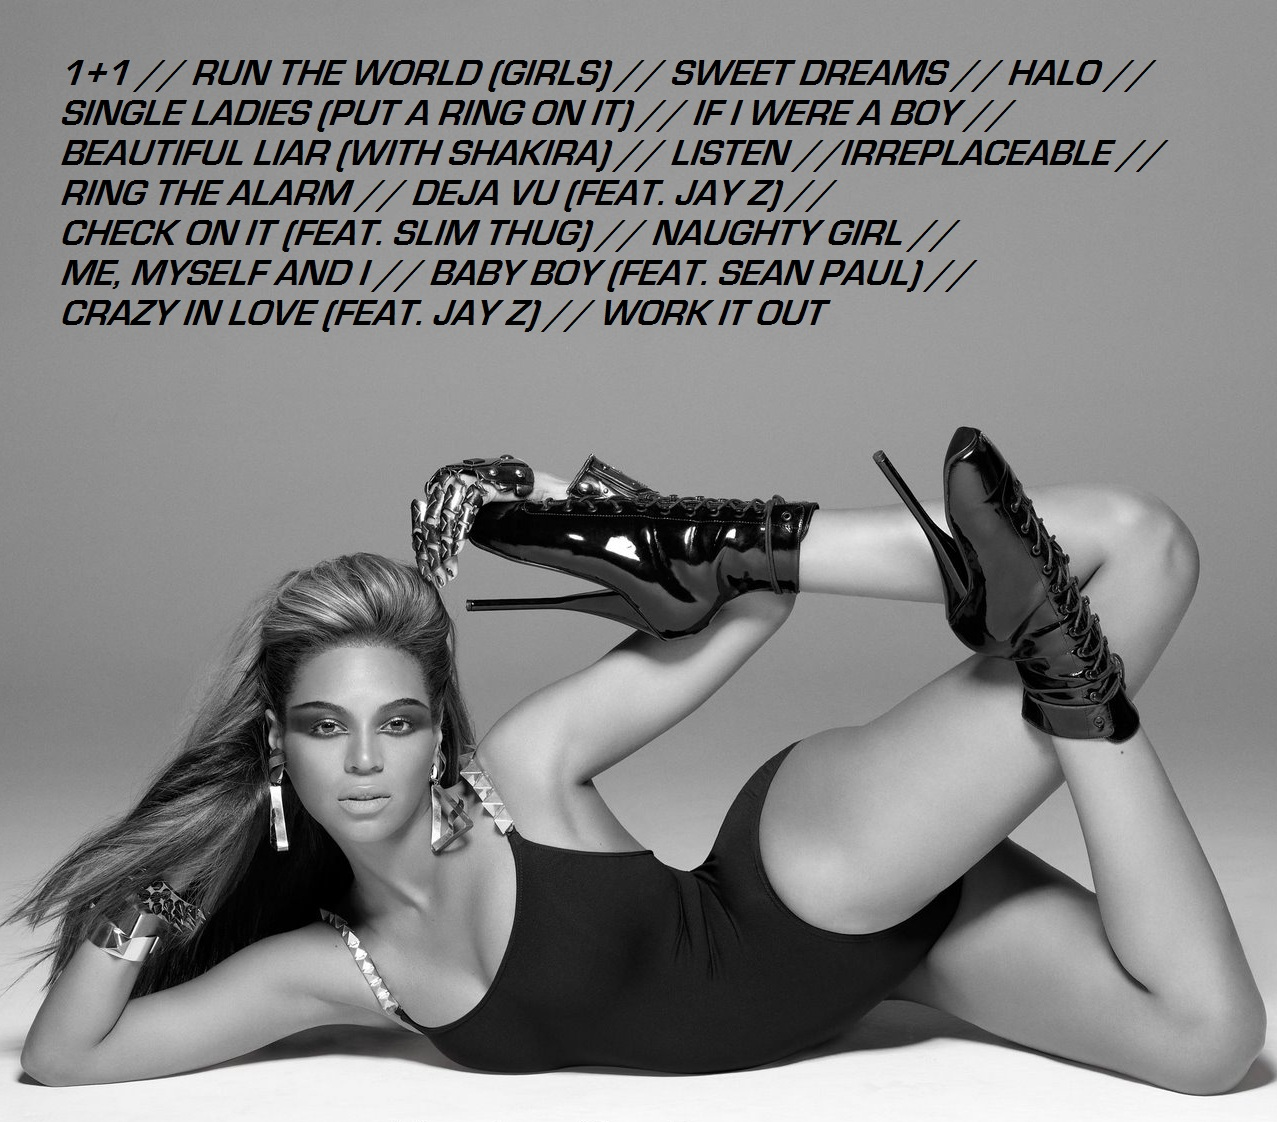 http://4.bp.blogspot.com/-OealwOrsqJ0/Td998MjgdTI/AAAAAAAAAIs/6R6AZqSi0SU/s1600/Beyonce-photo-shoot-beyonce-2740424-1600-1122.jpg